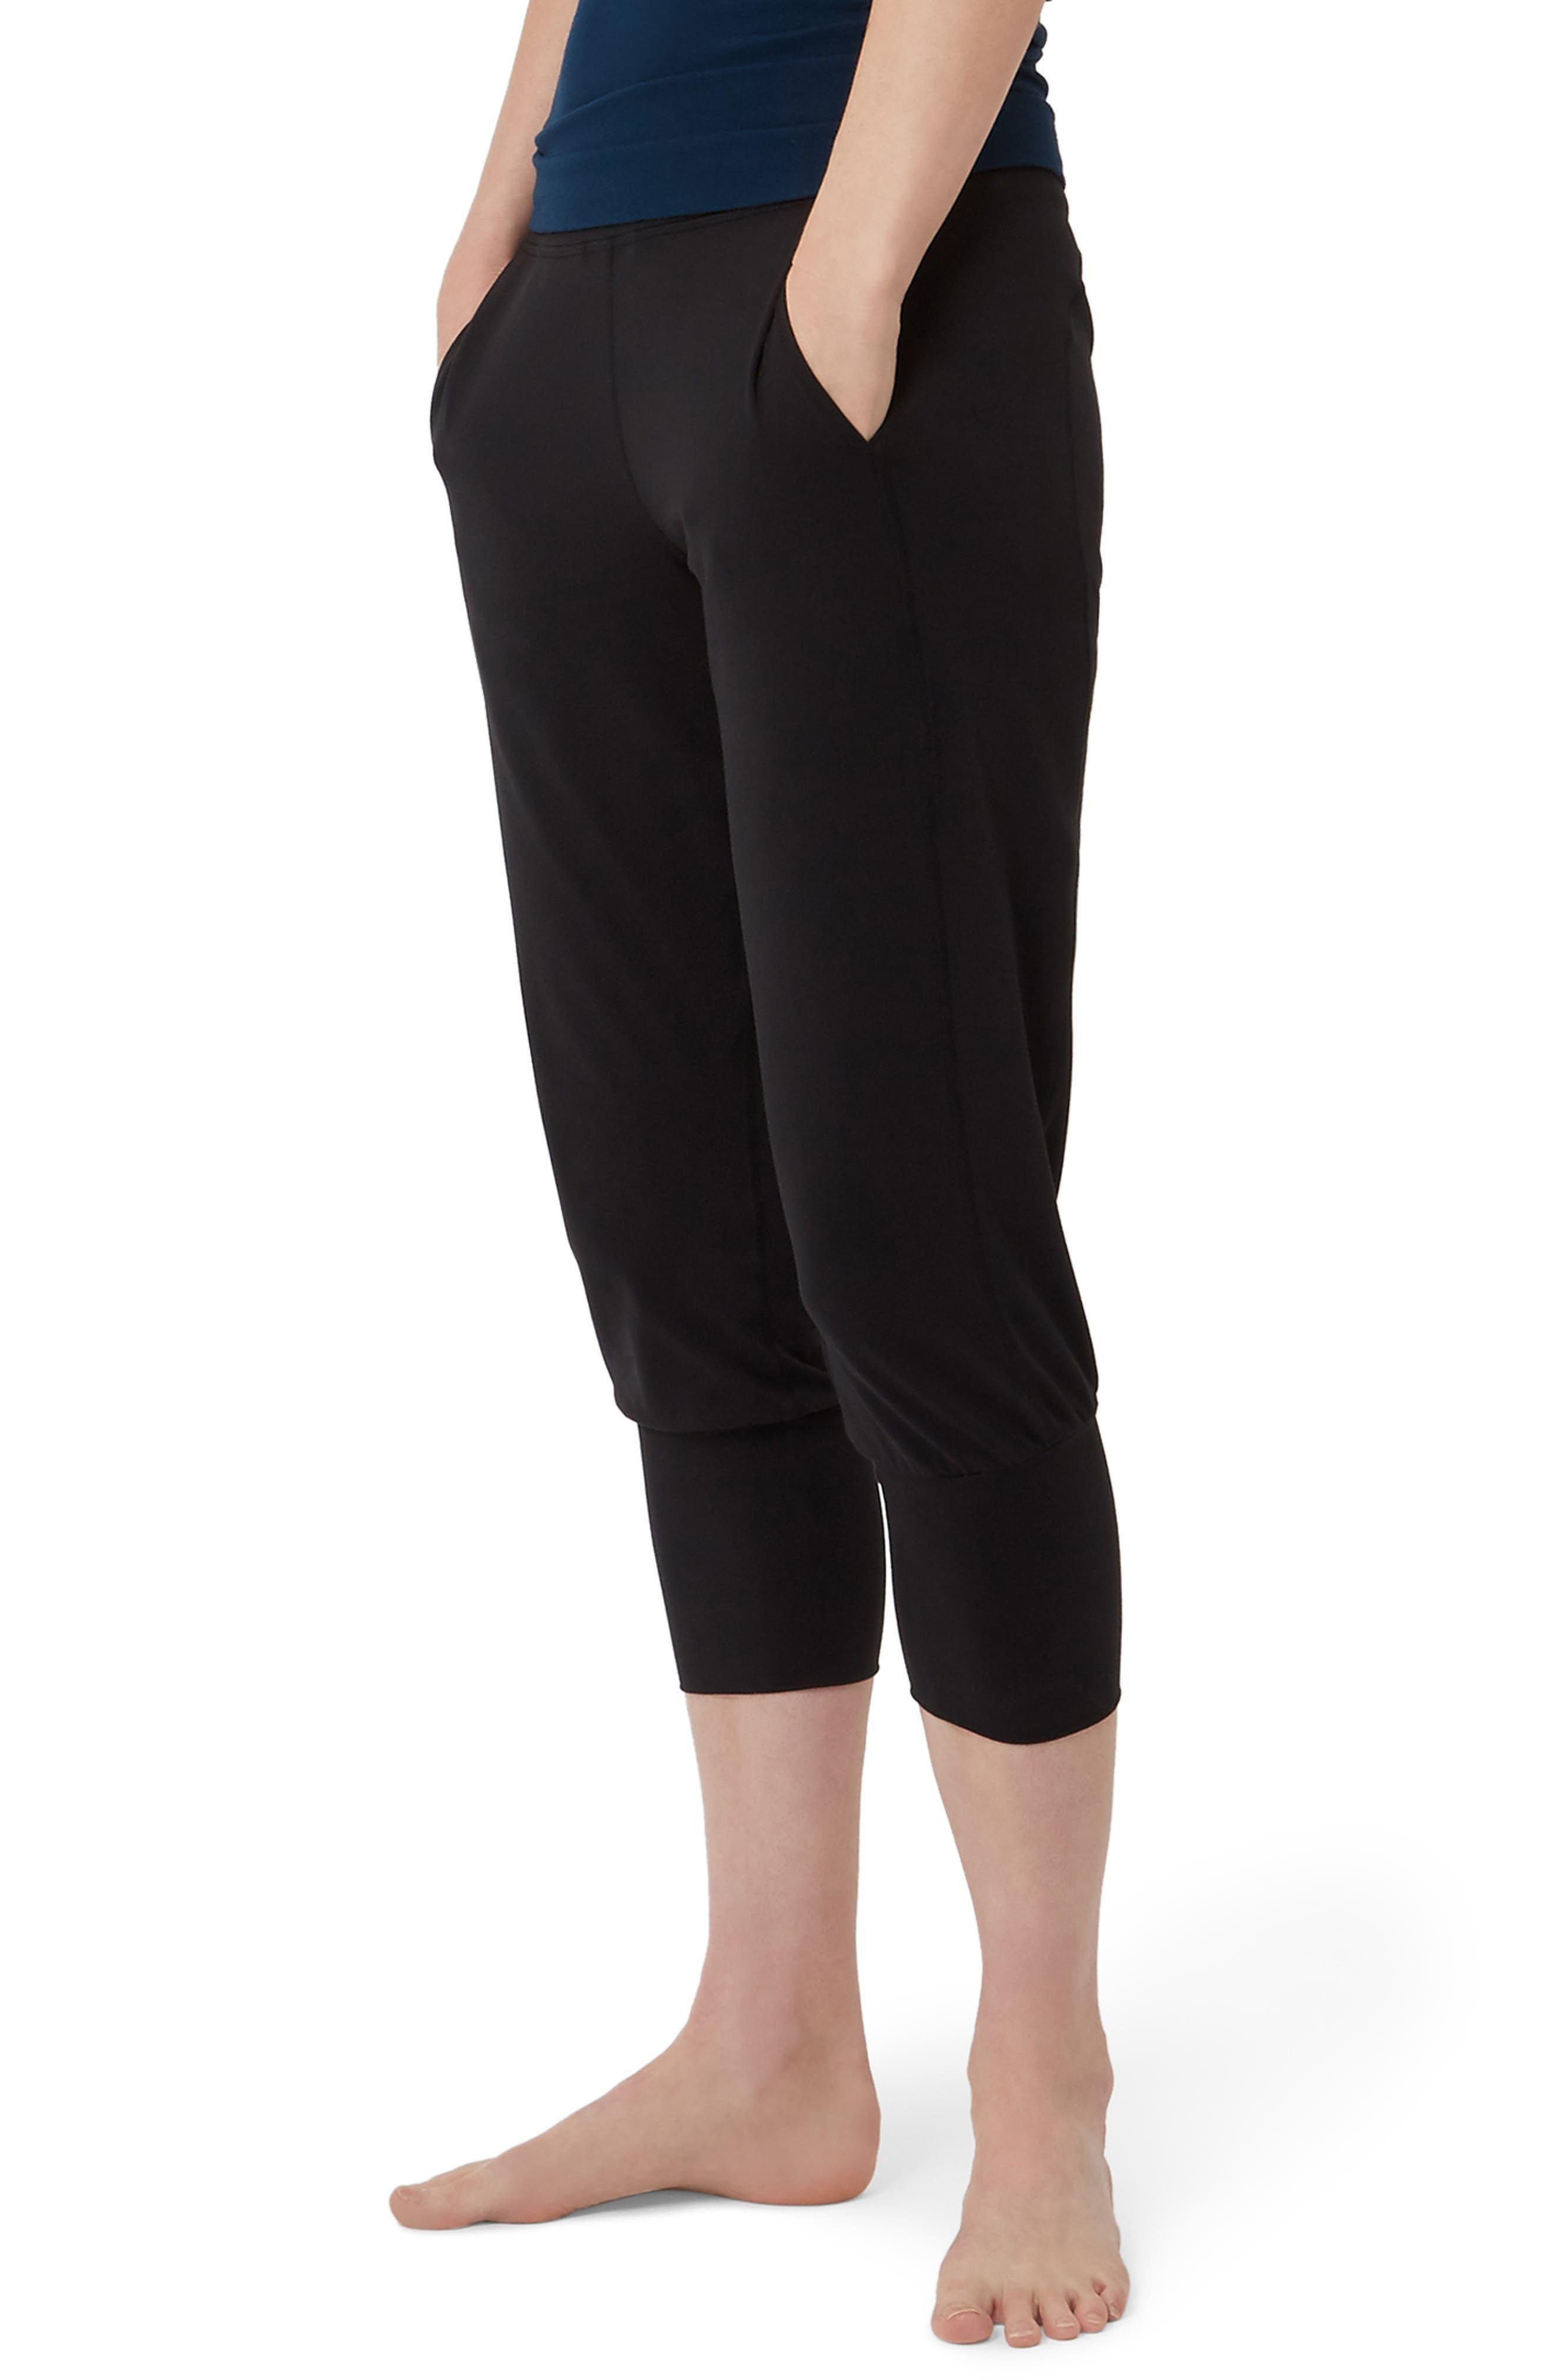 Garudasana Crop Yoga Trousers,                             Alternate thumbnail 3, color,                             BLACK